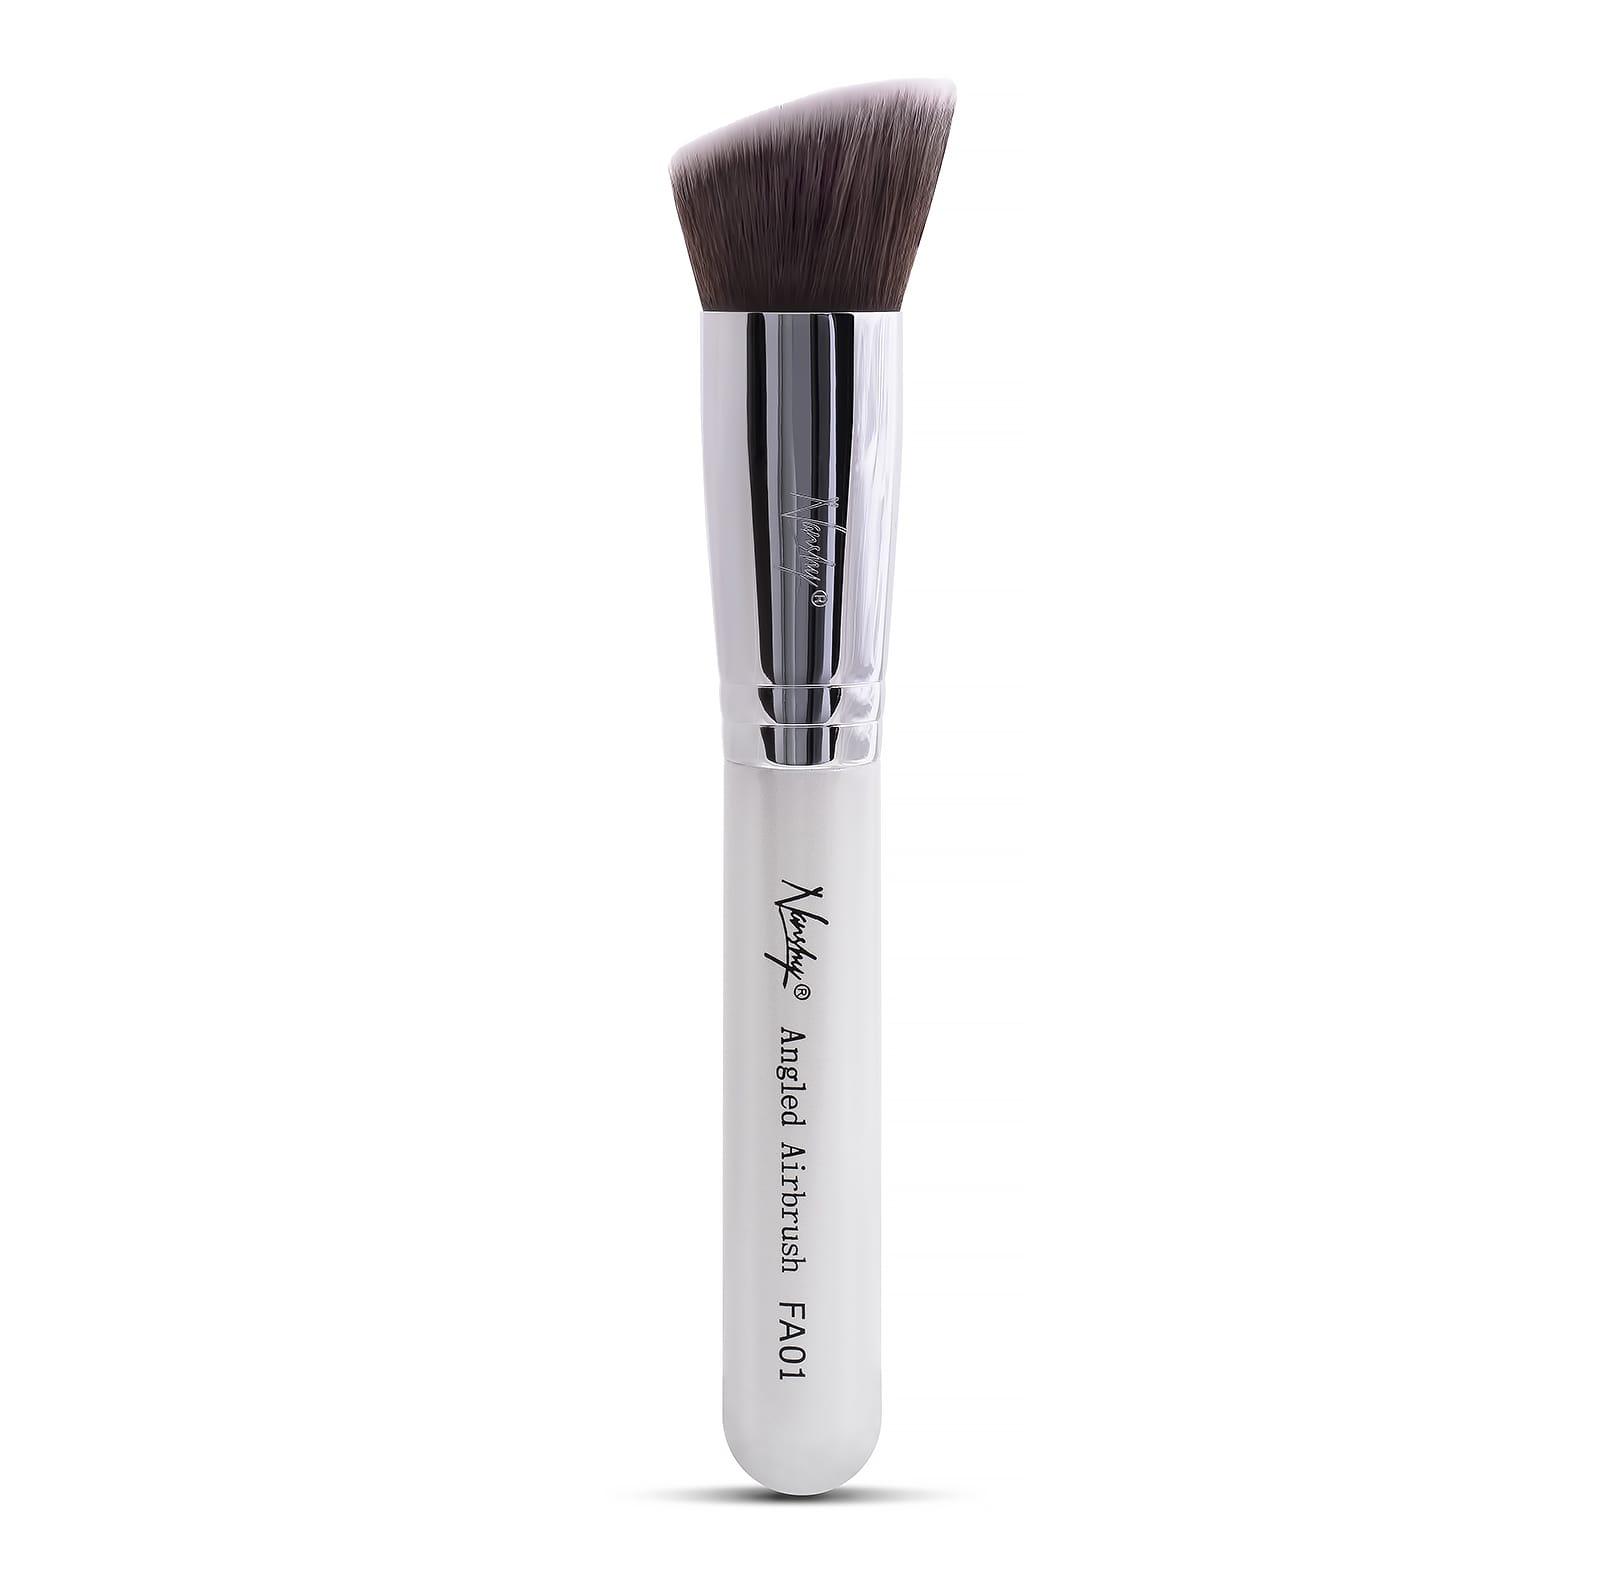 Angled Airbrush FA01 Flat Angled Kabuki Makeup Brush